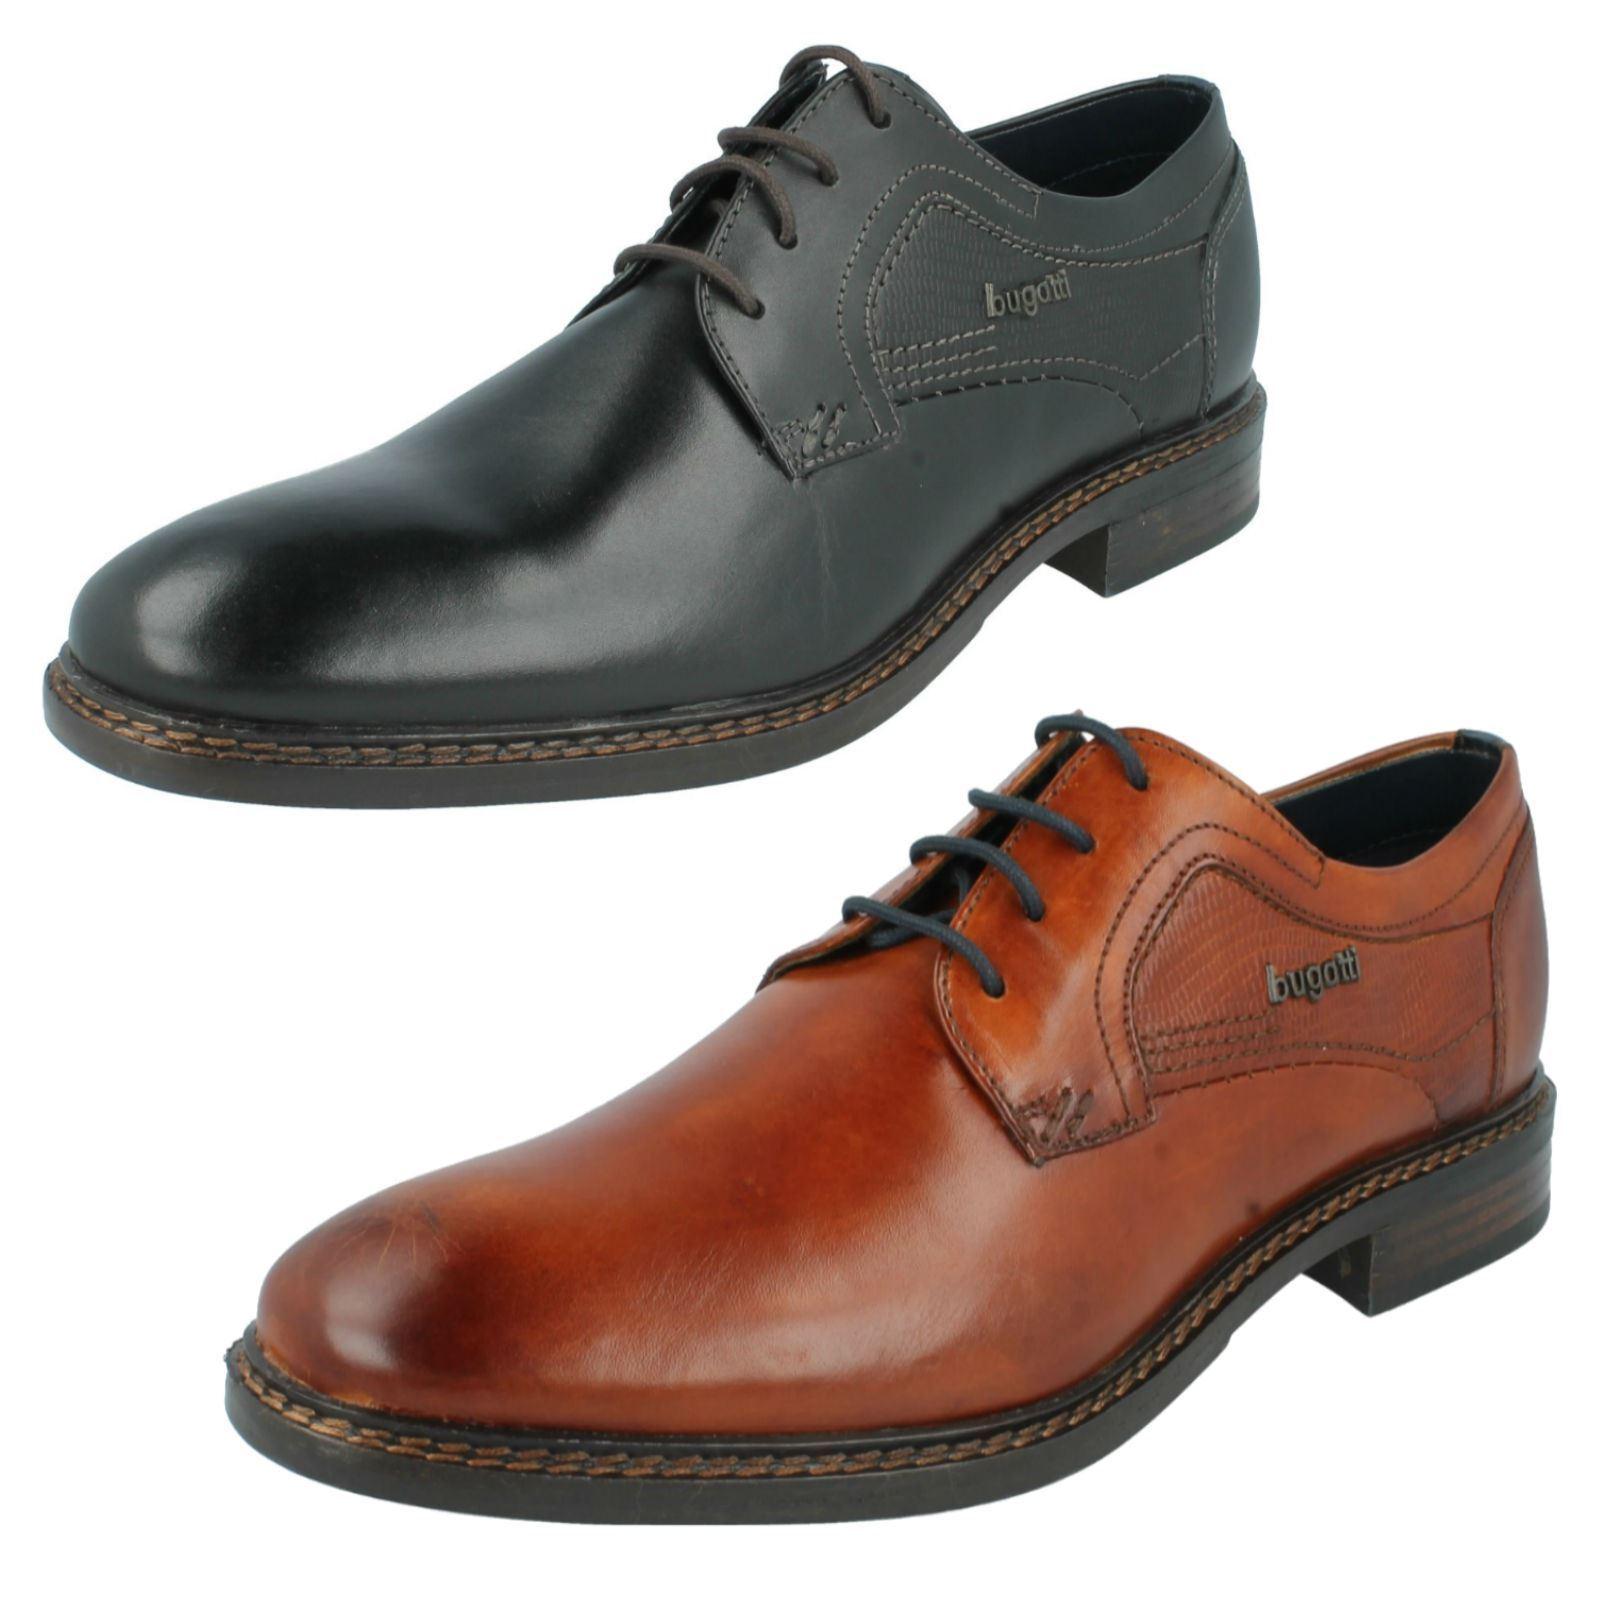 Men's Bugatti Formal Shoes - Bene U9008